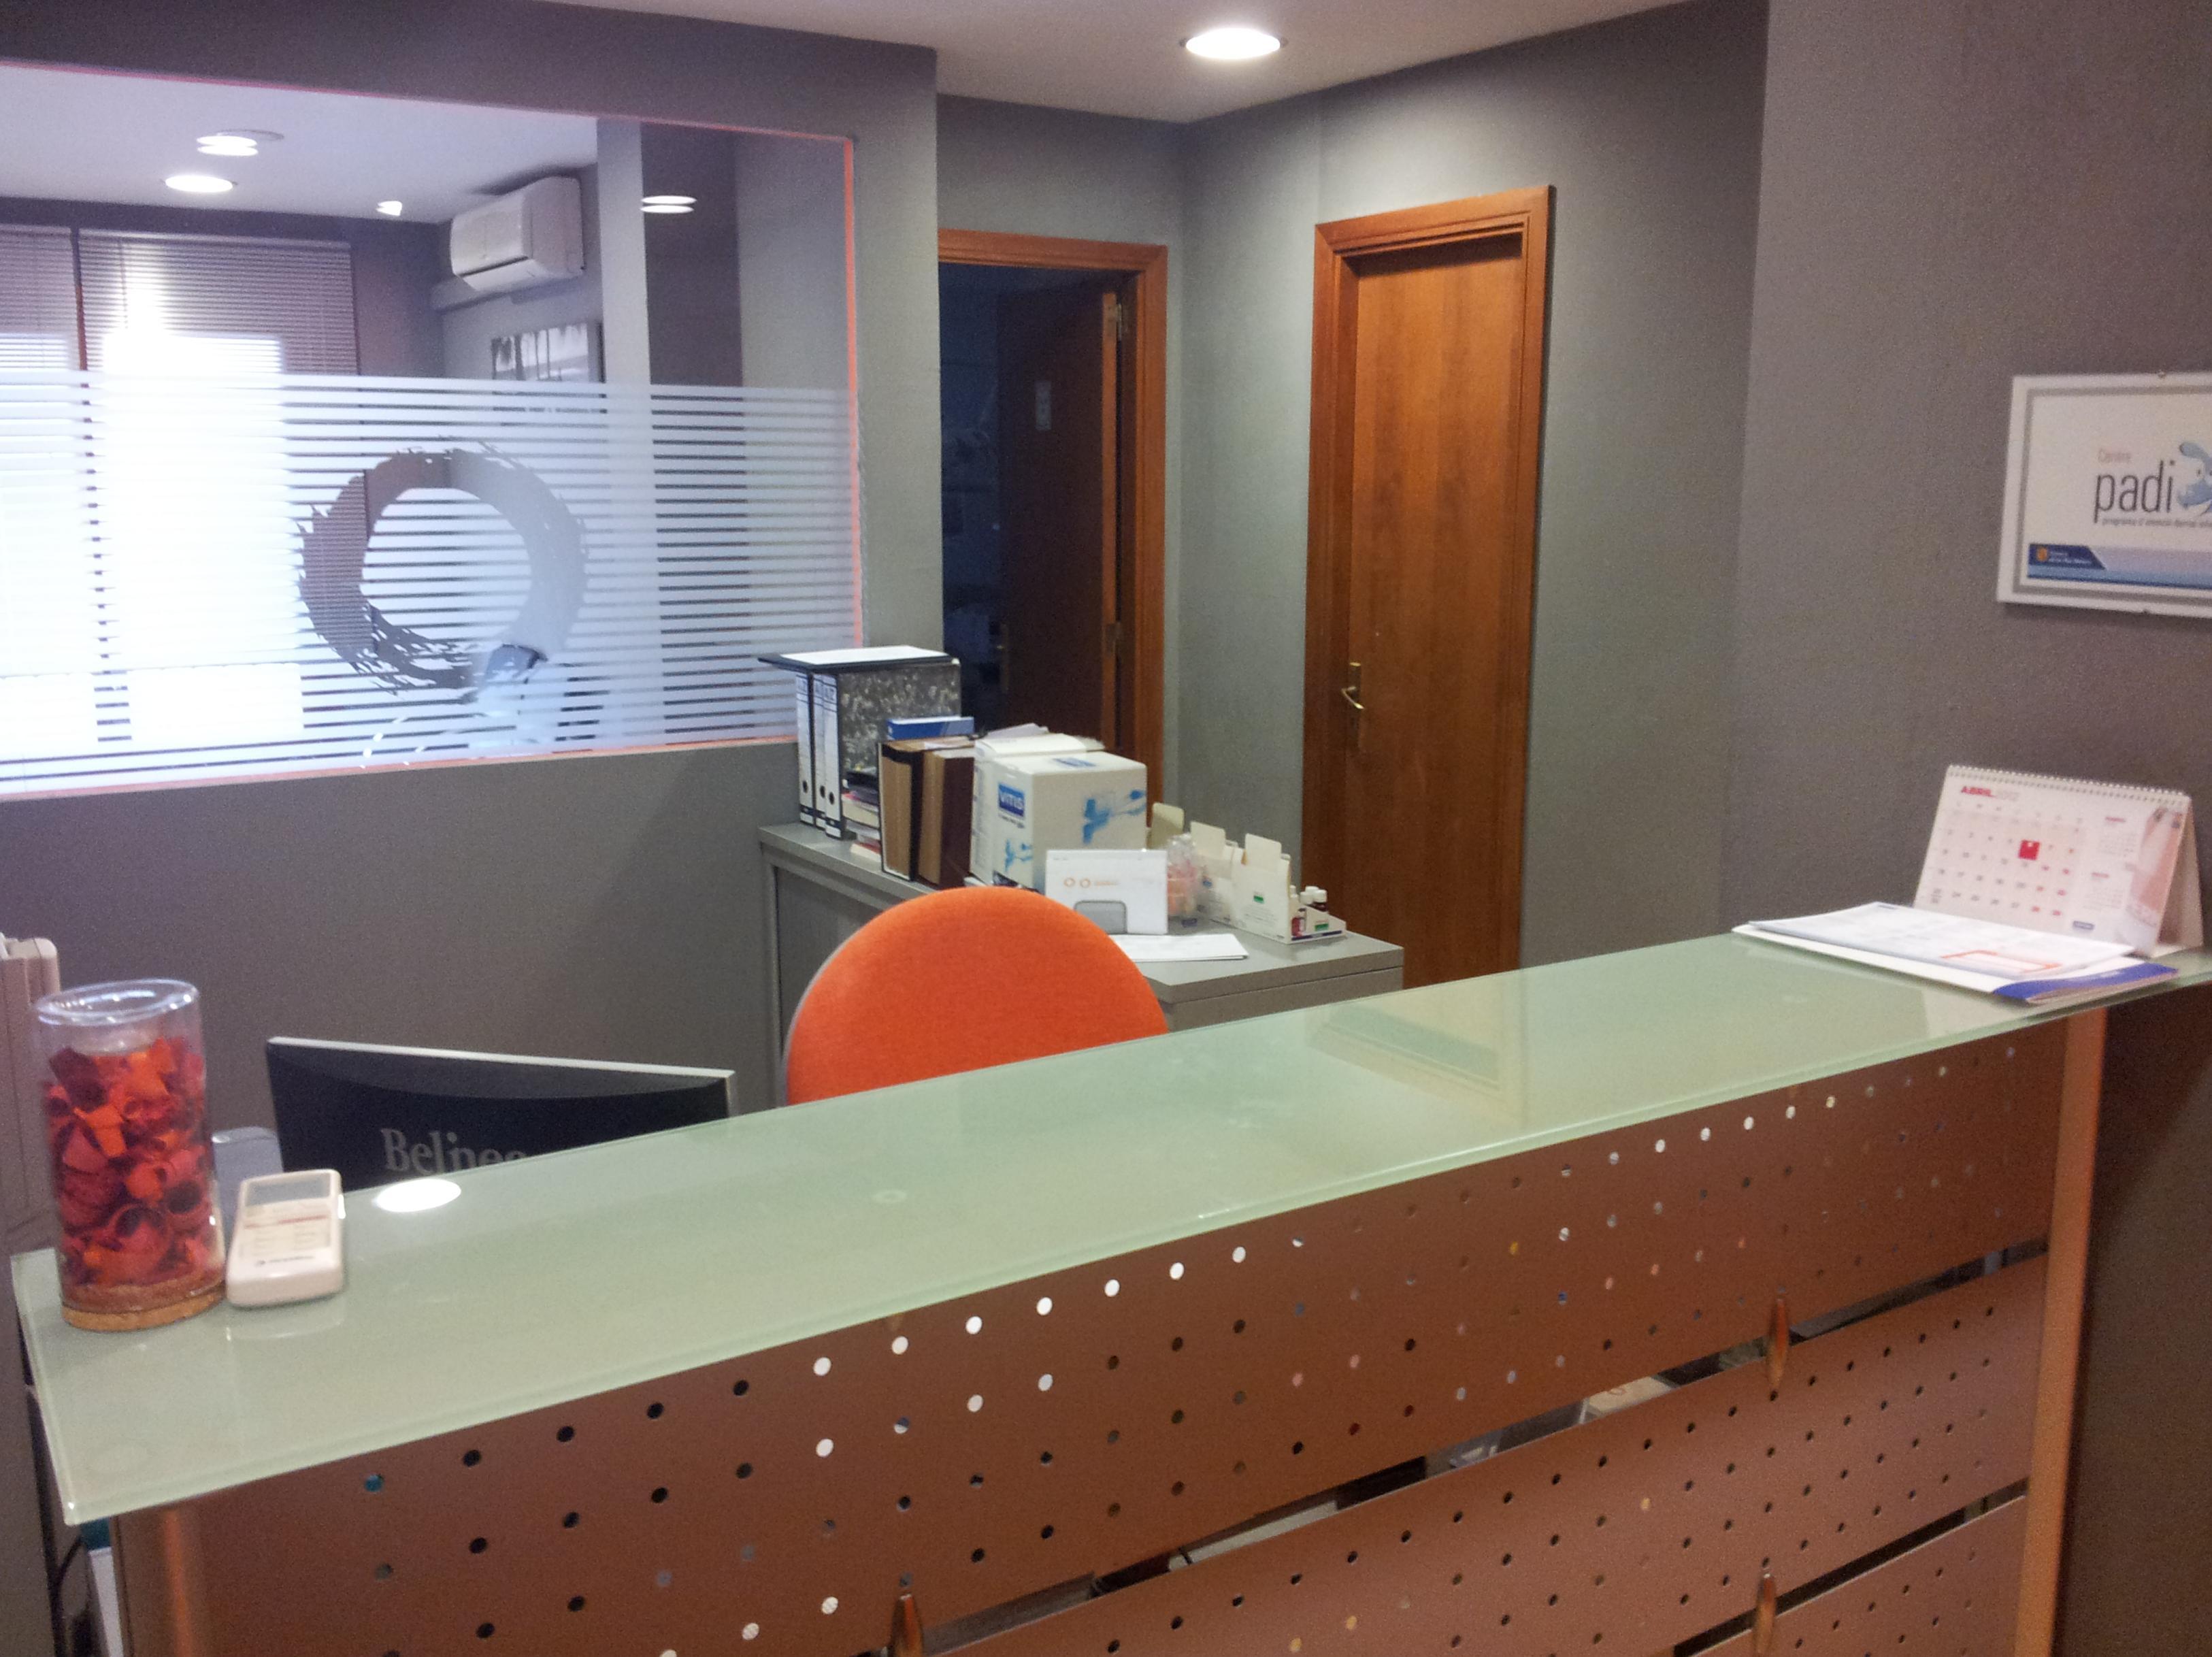 Foto 2 de Clínicas dentales en POLLENÇA | Clínica Dental Rident